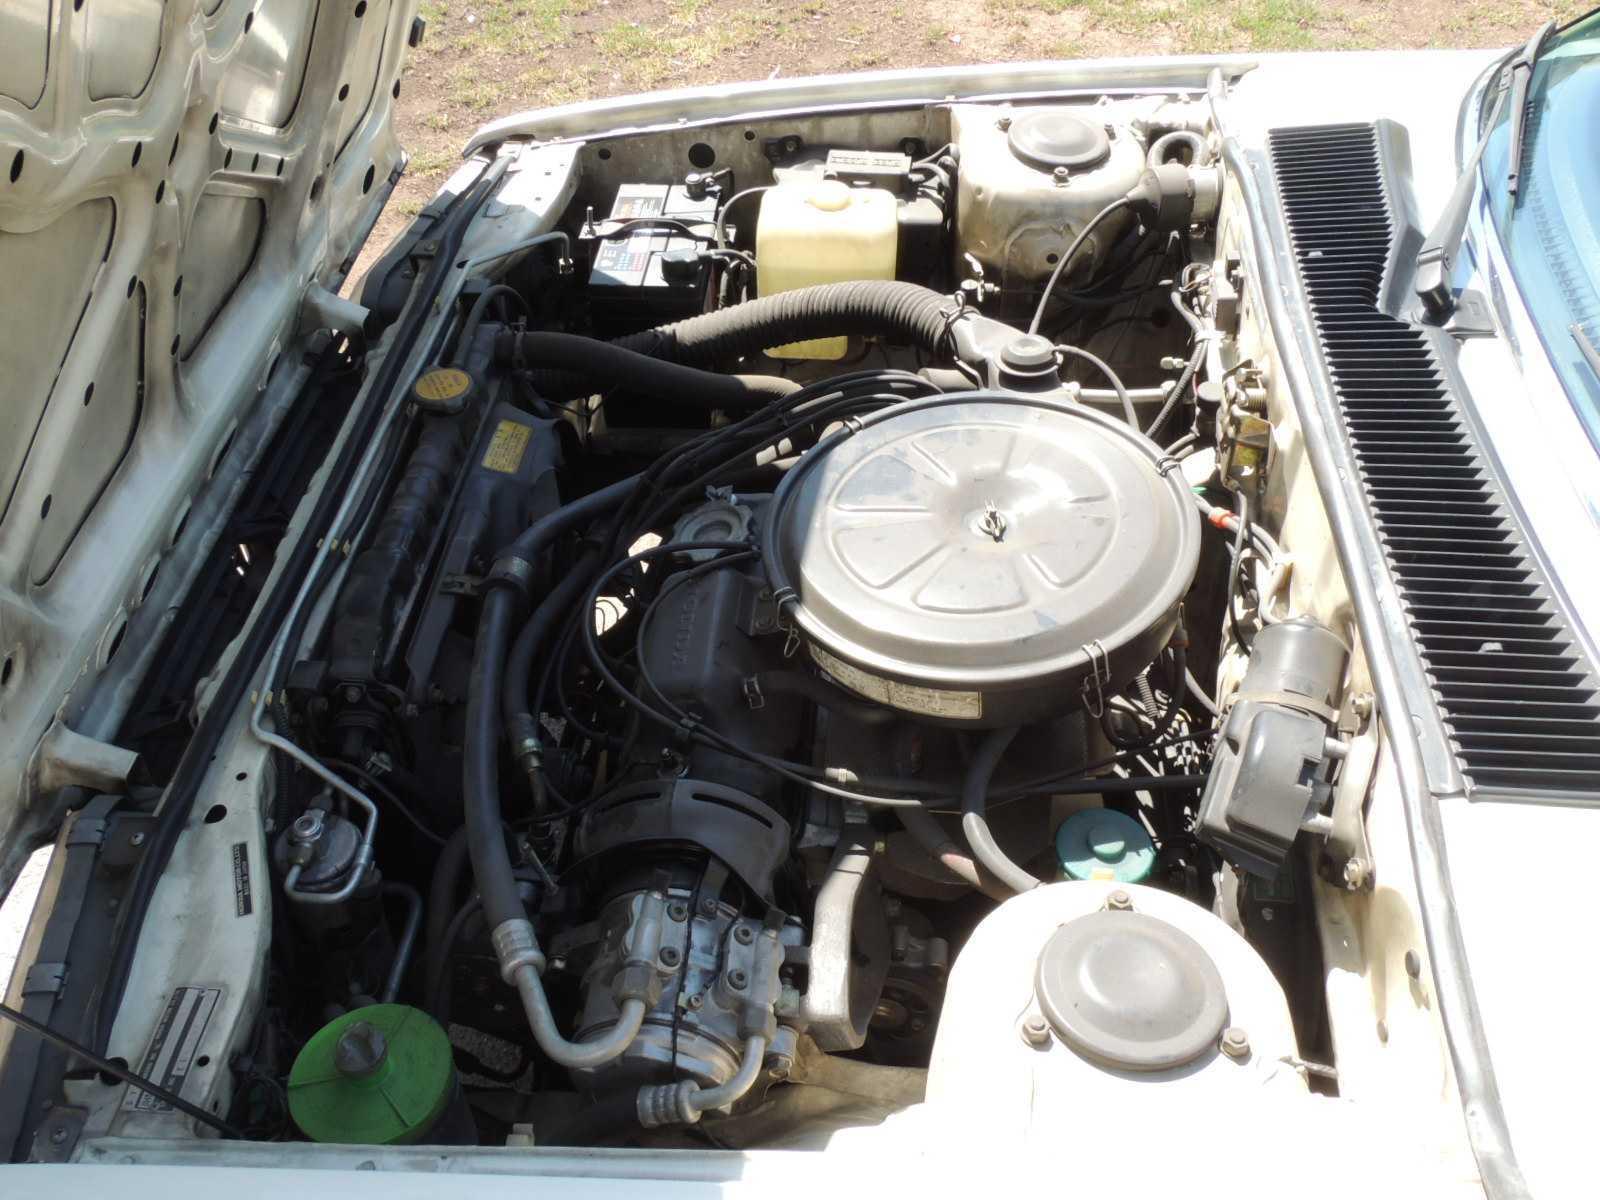 Honda Accord 1.6 EX Hondamatic 1983 Rutamotor Clásicos (38)